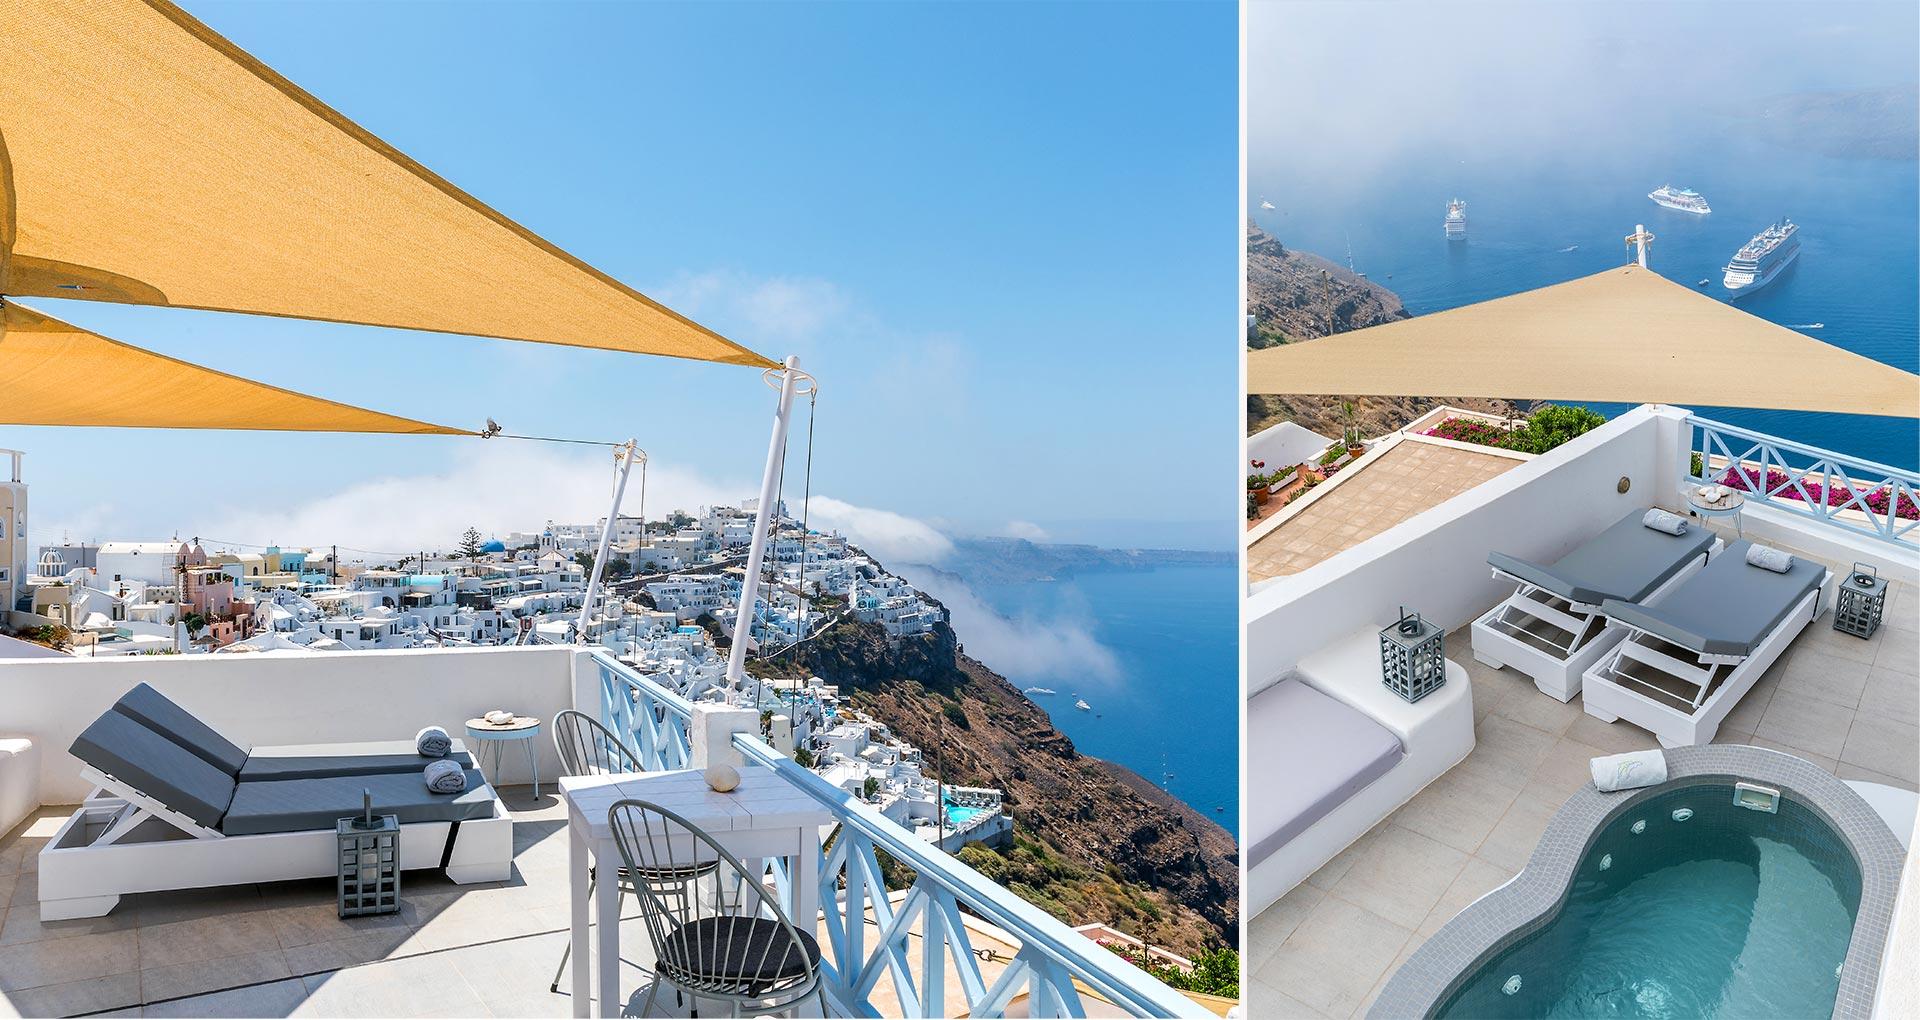 honeymoon suites apartmens panoramic view santorini bluedolphins 2